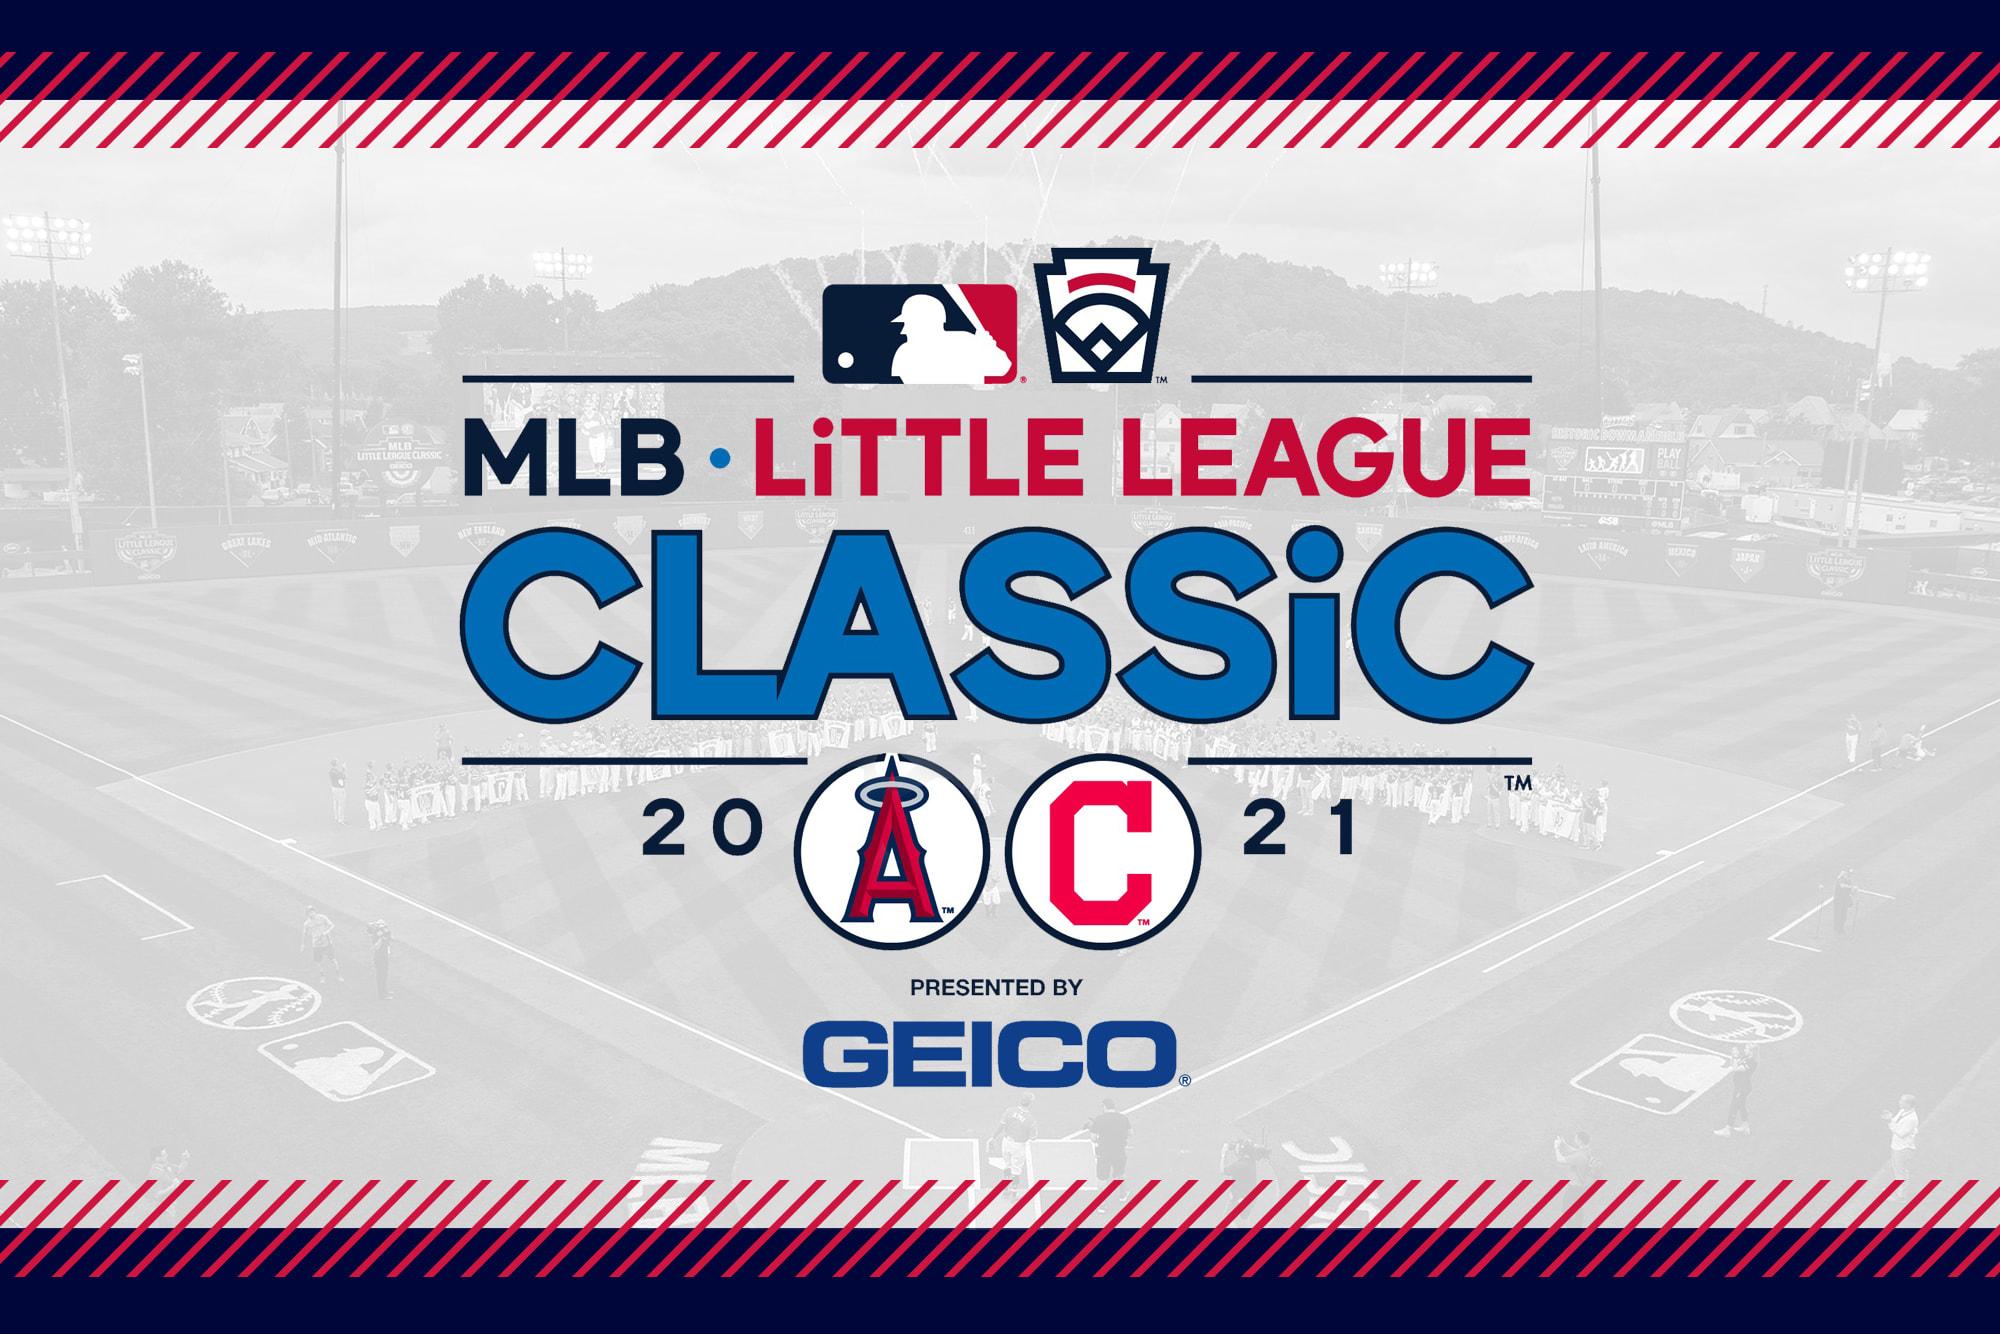 2001 MLB Little League Classic